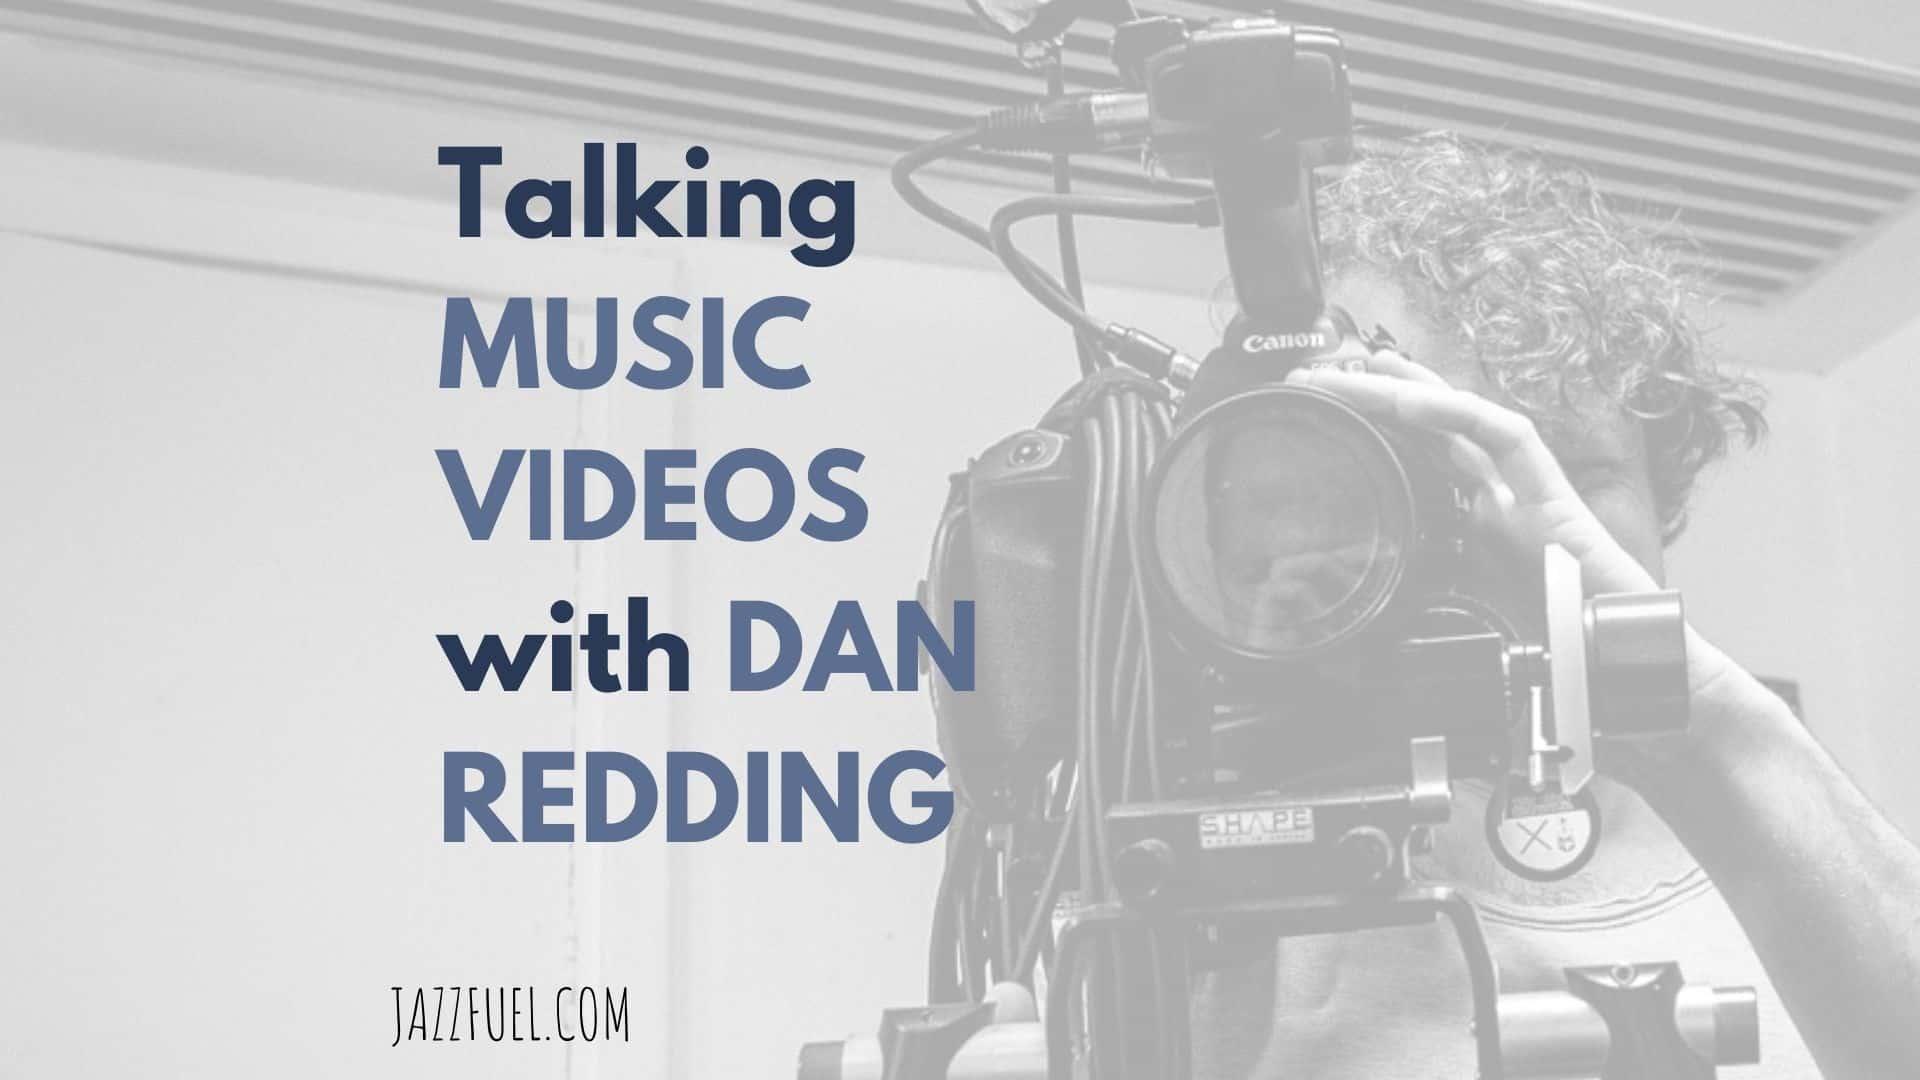 Talking music videos with Dan Redding